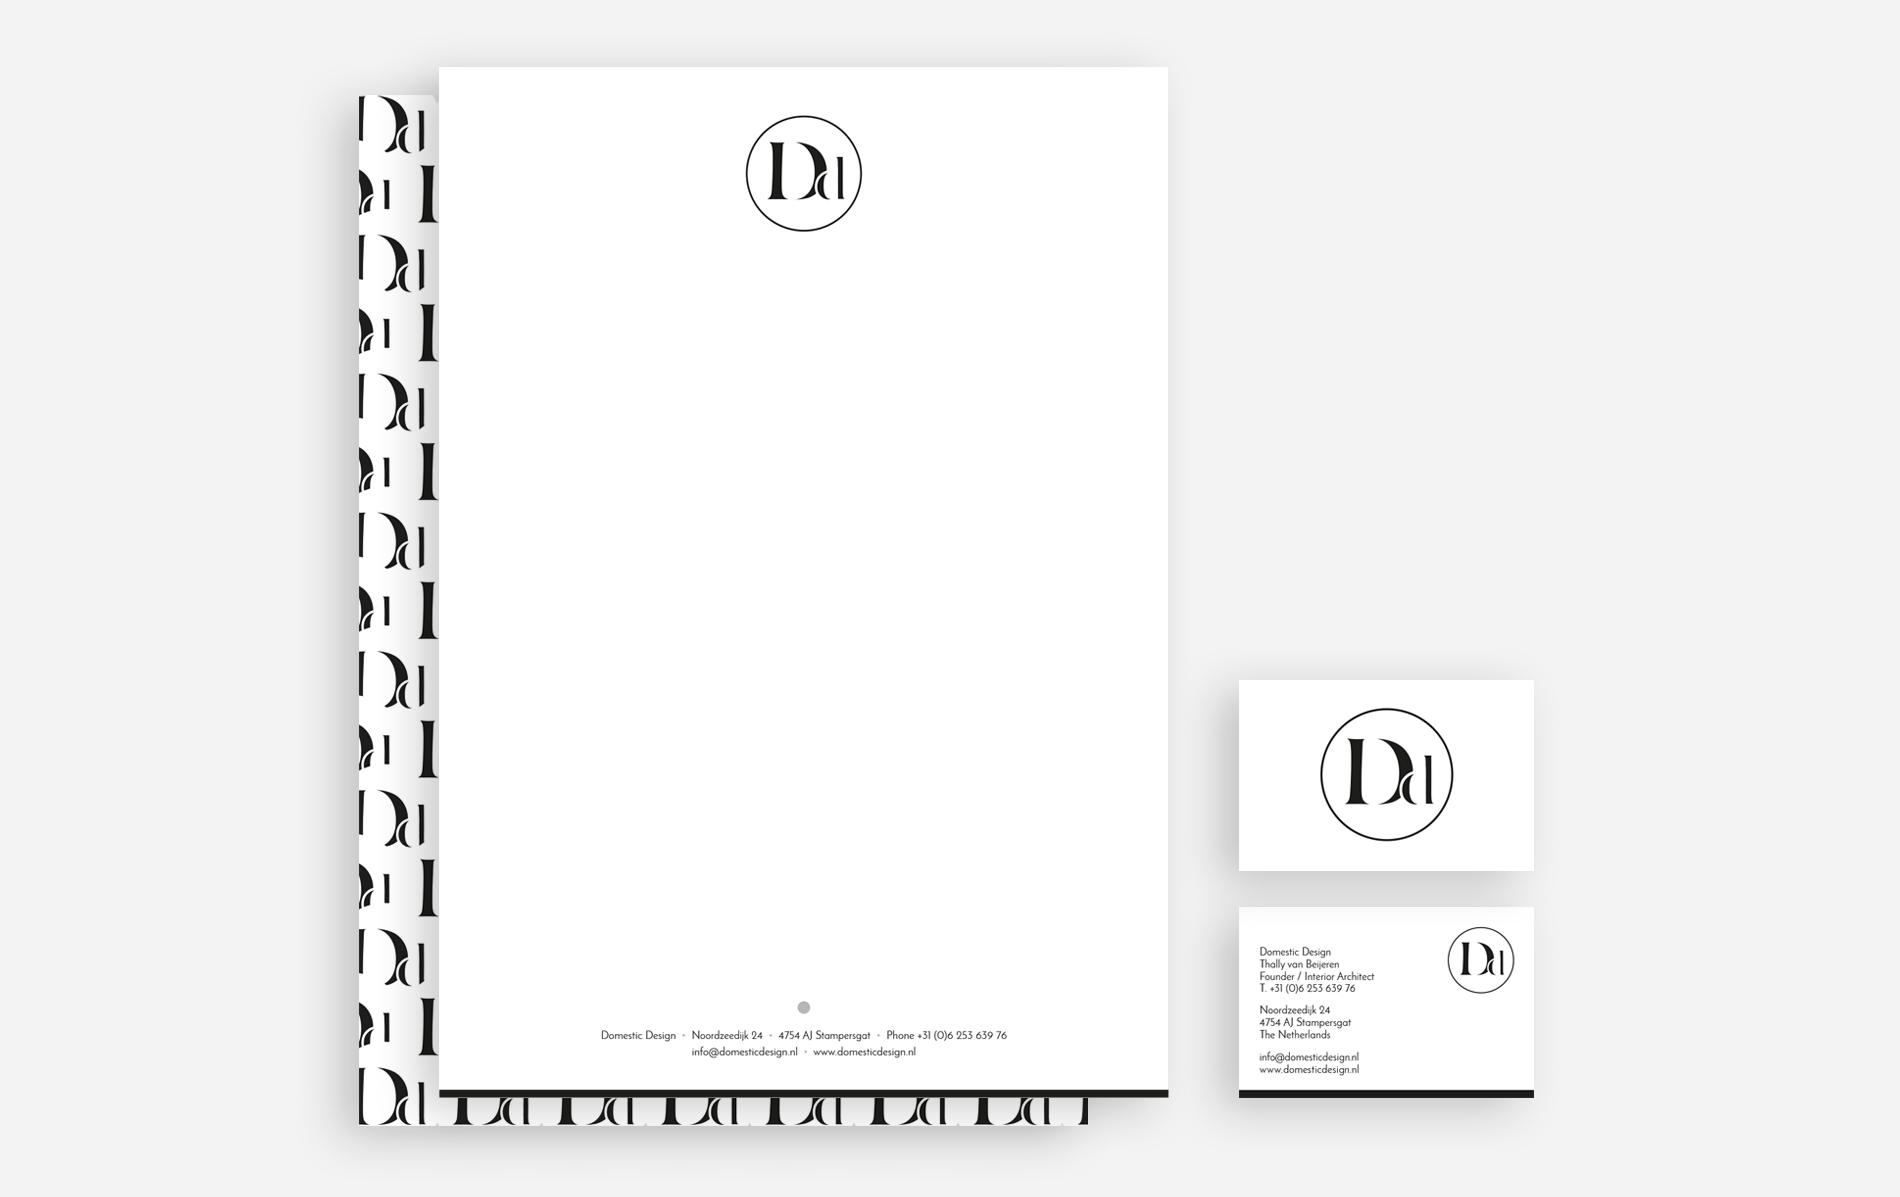 Anouk-Stoffels-Domestic-Design-identiteit